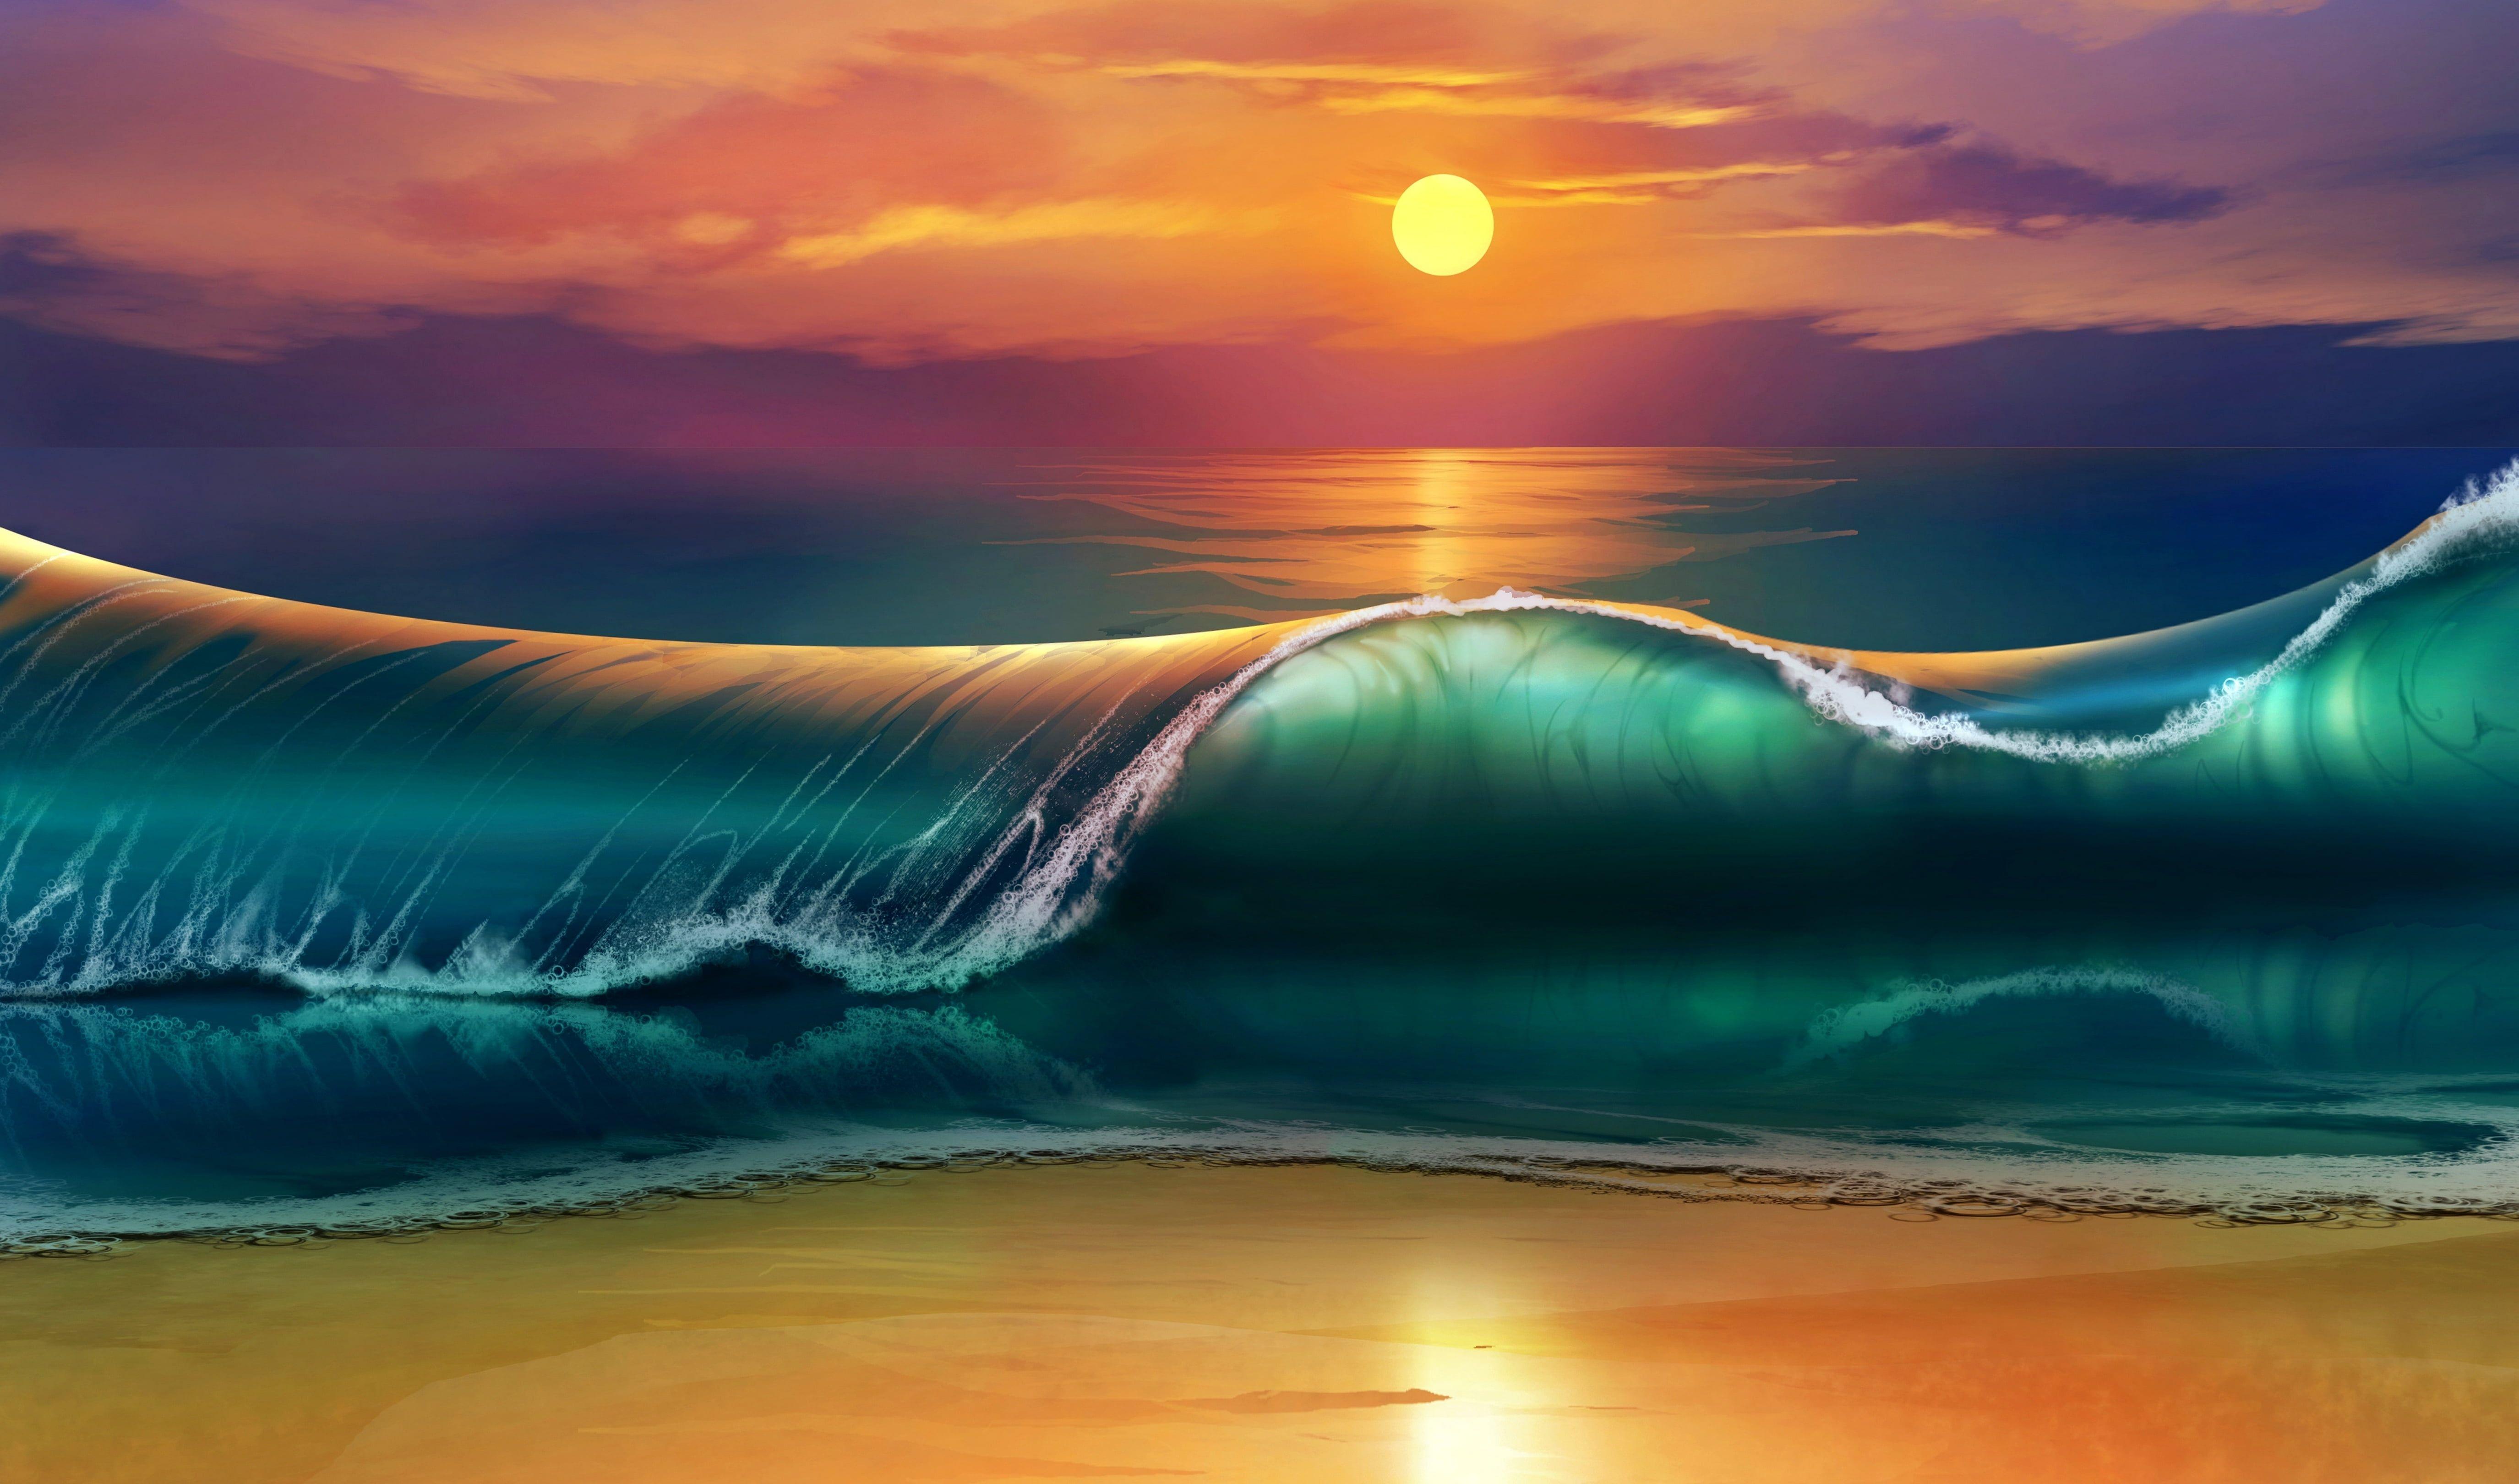 Sea Wave During Daytime Illustration Art Sunset Beach Sea Waves 5k Wallpaper Hdwallpaper Beach Sunset Wallpaper Sunset Wallpaper Ocean Waves Painting